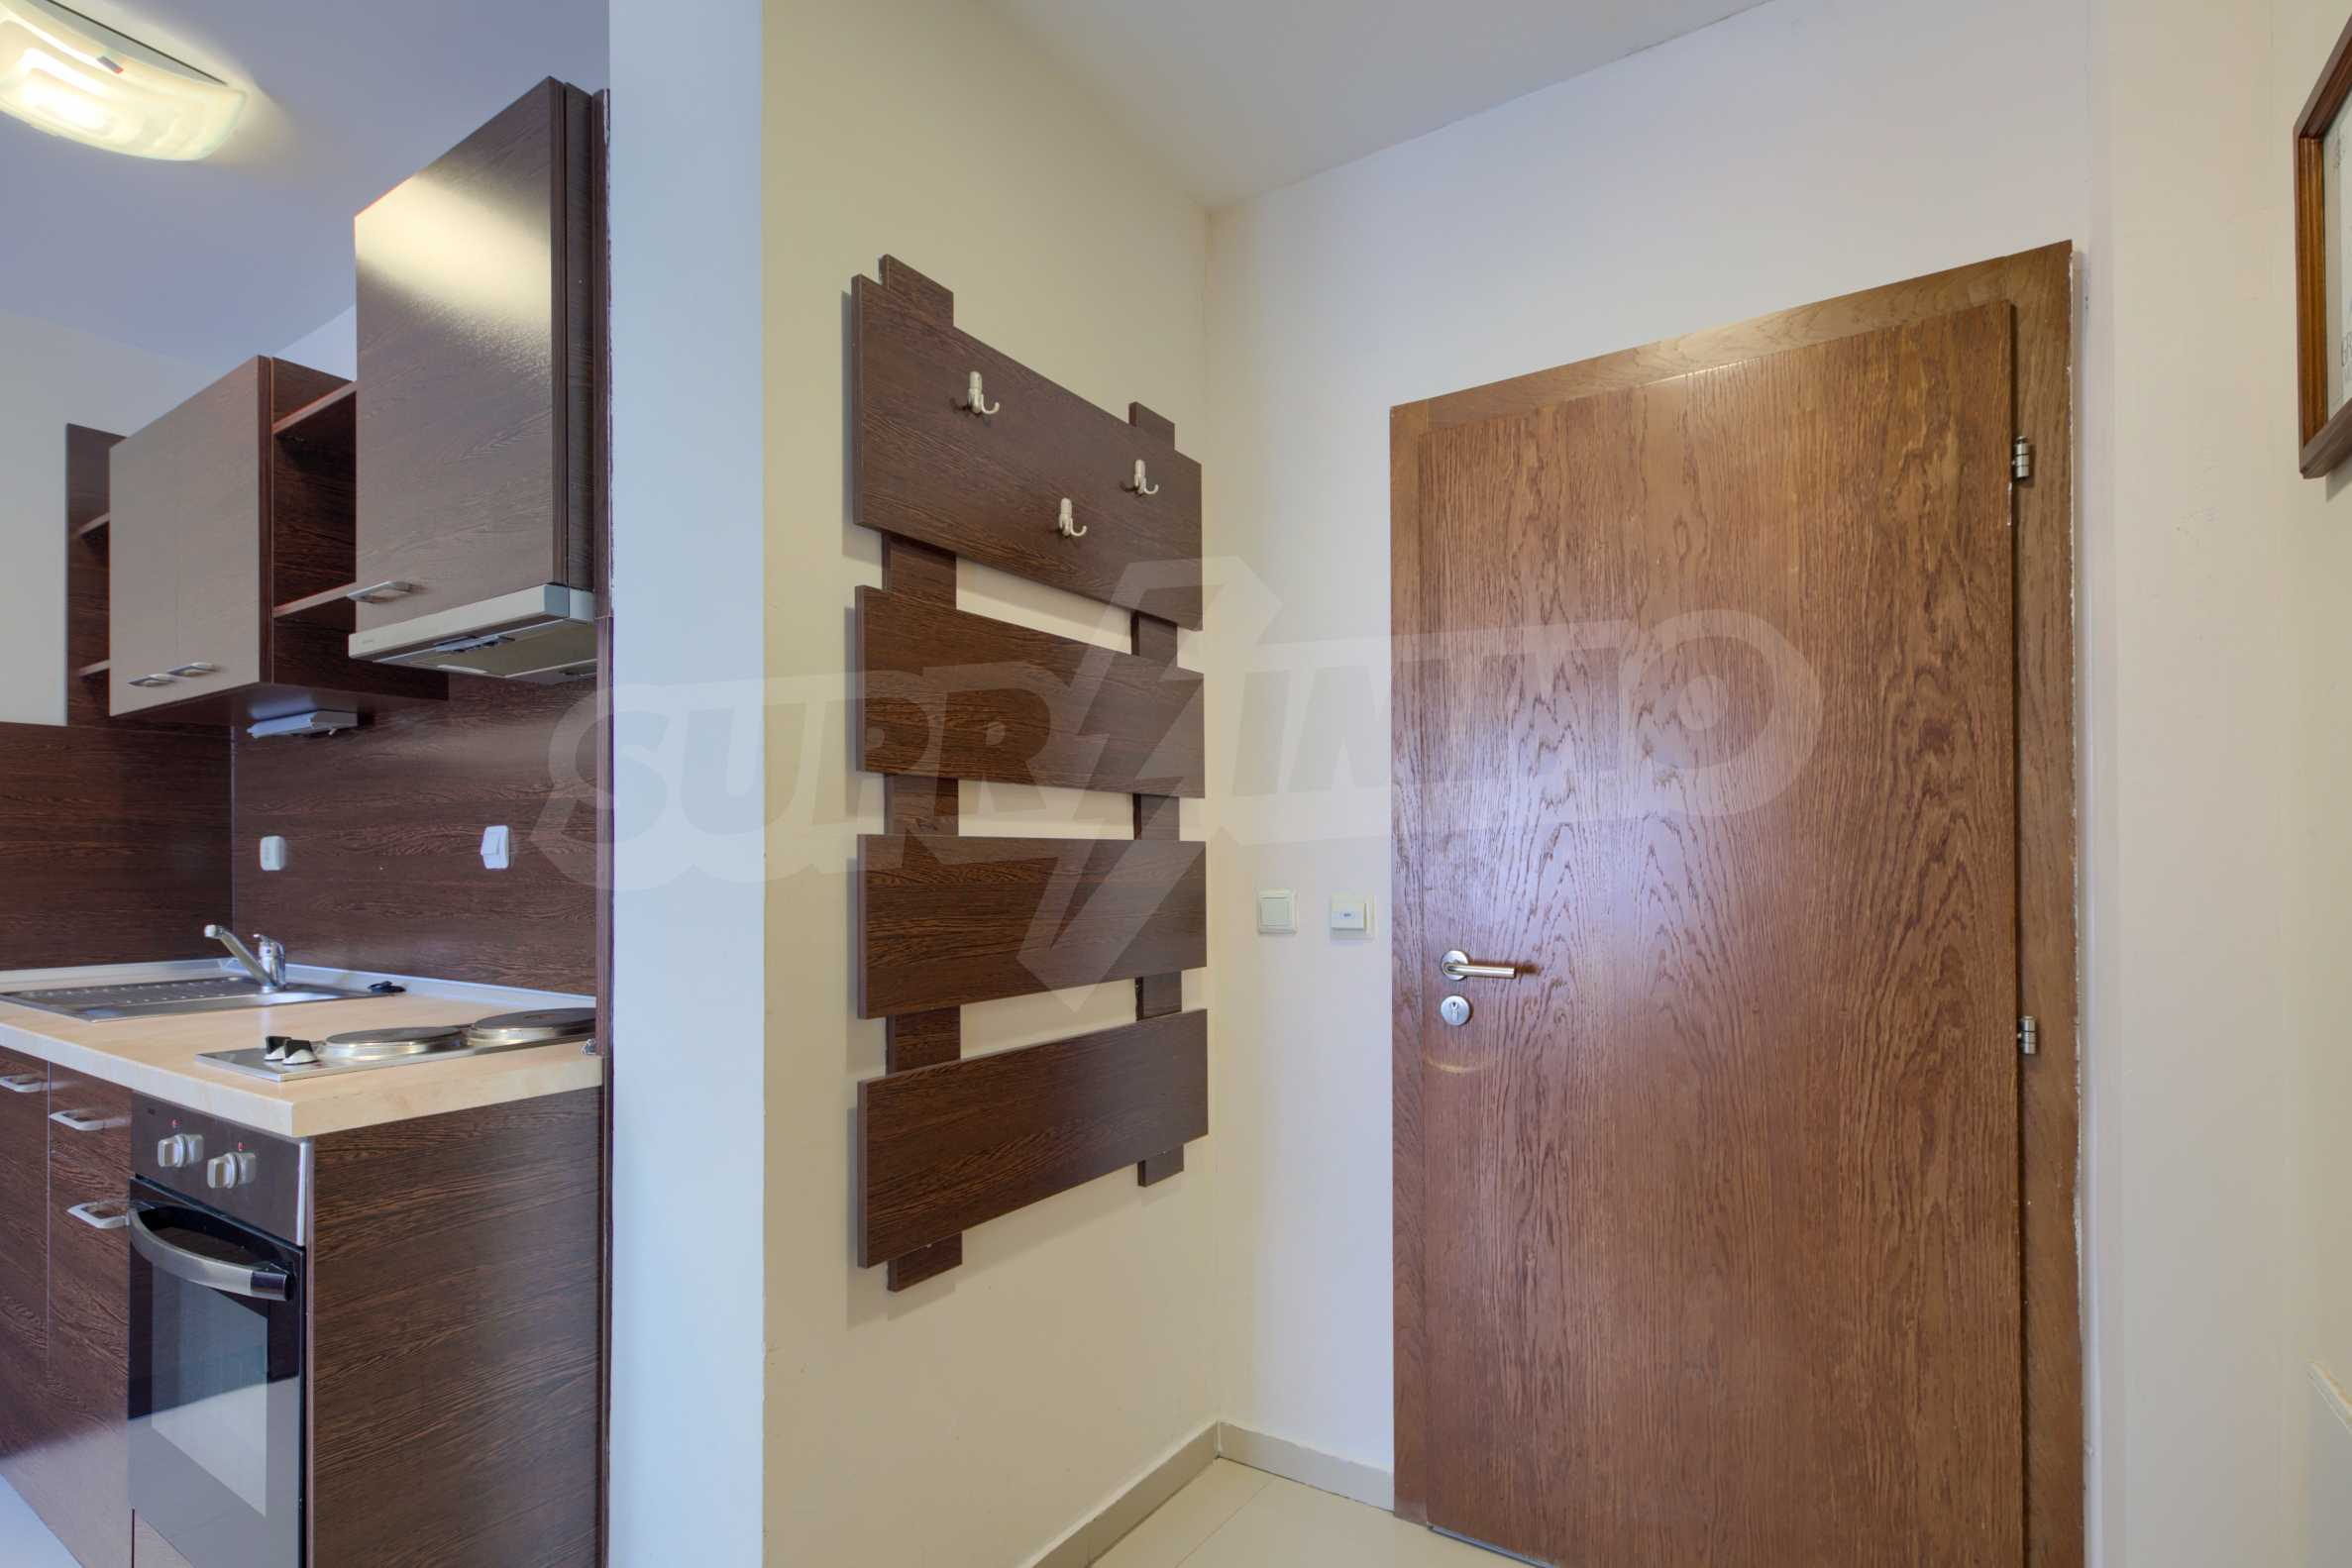 Двустаен апартамент за продажба в гр. Банско 4